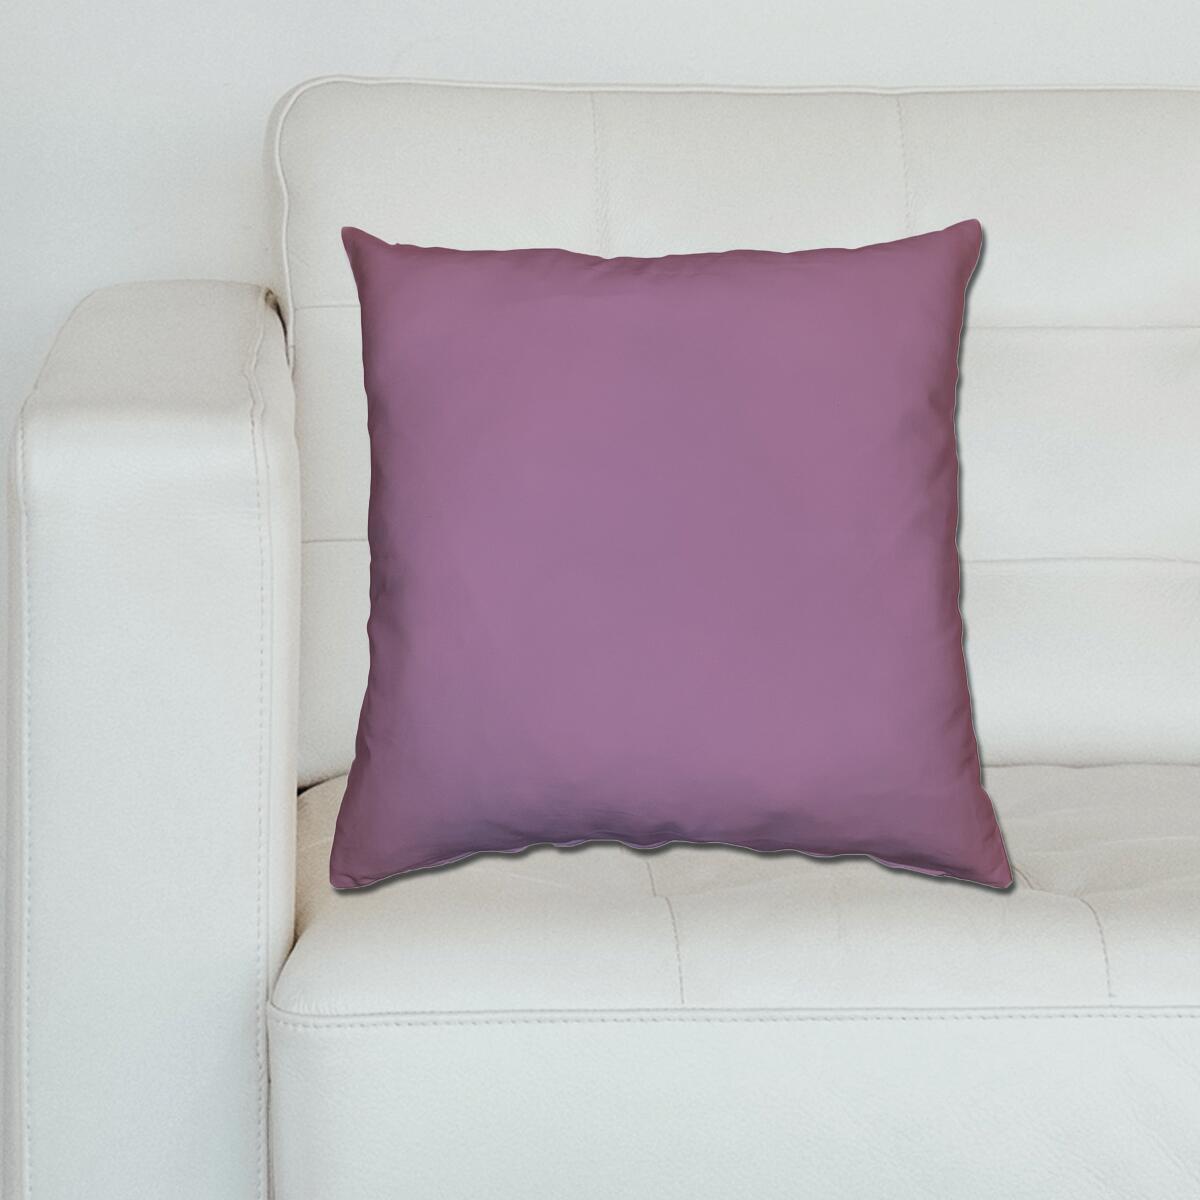 Cuscino Loneta lilla 60x60 cm - 2